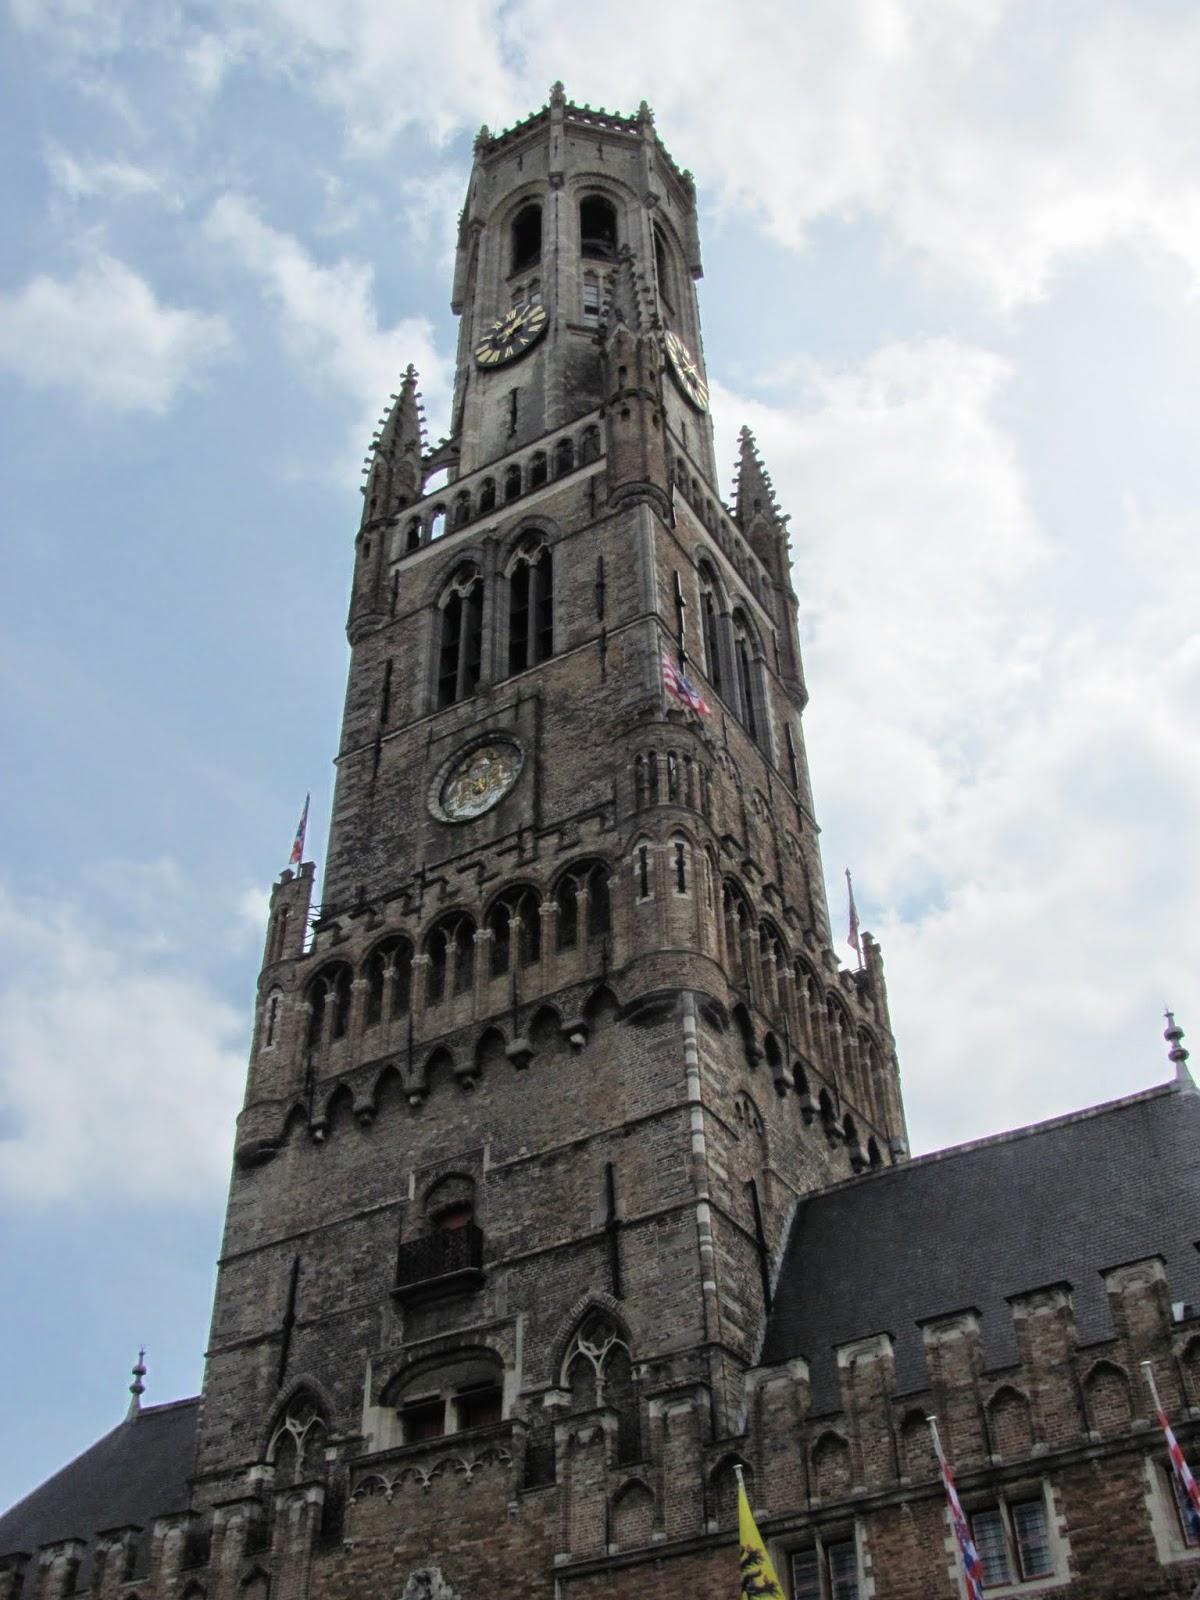 Bruges Bell Tower, Belgium